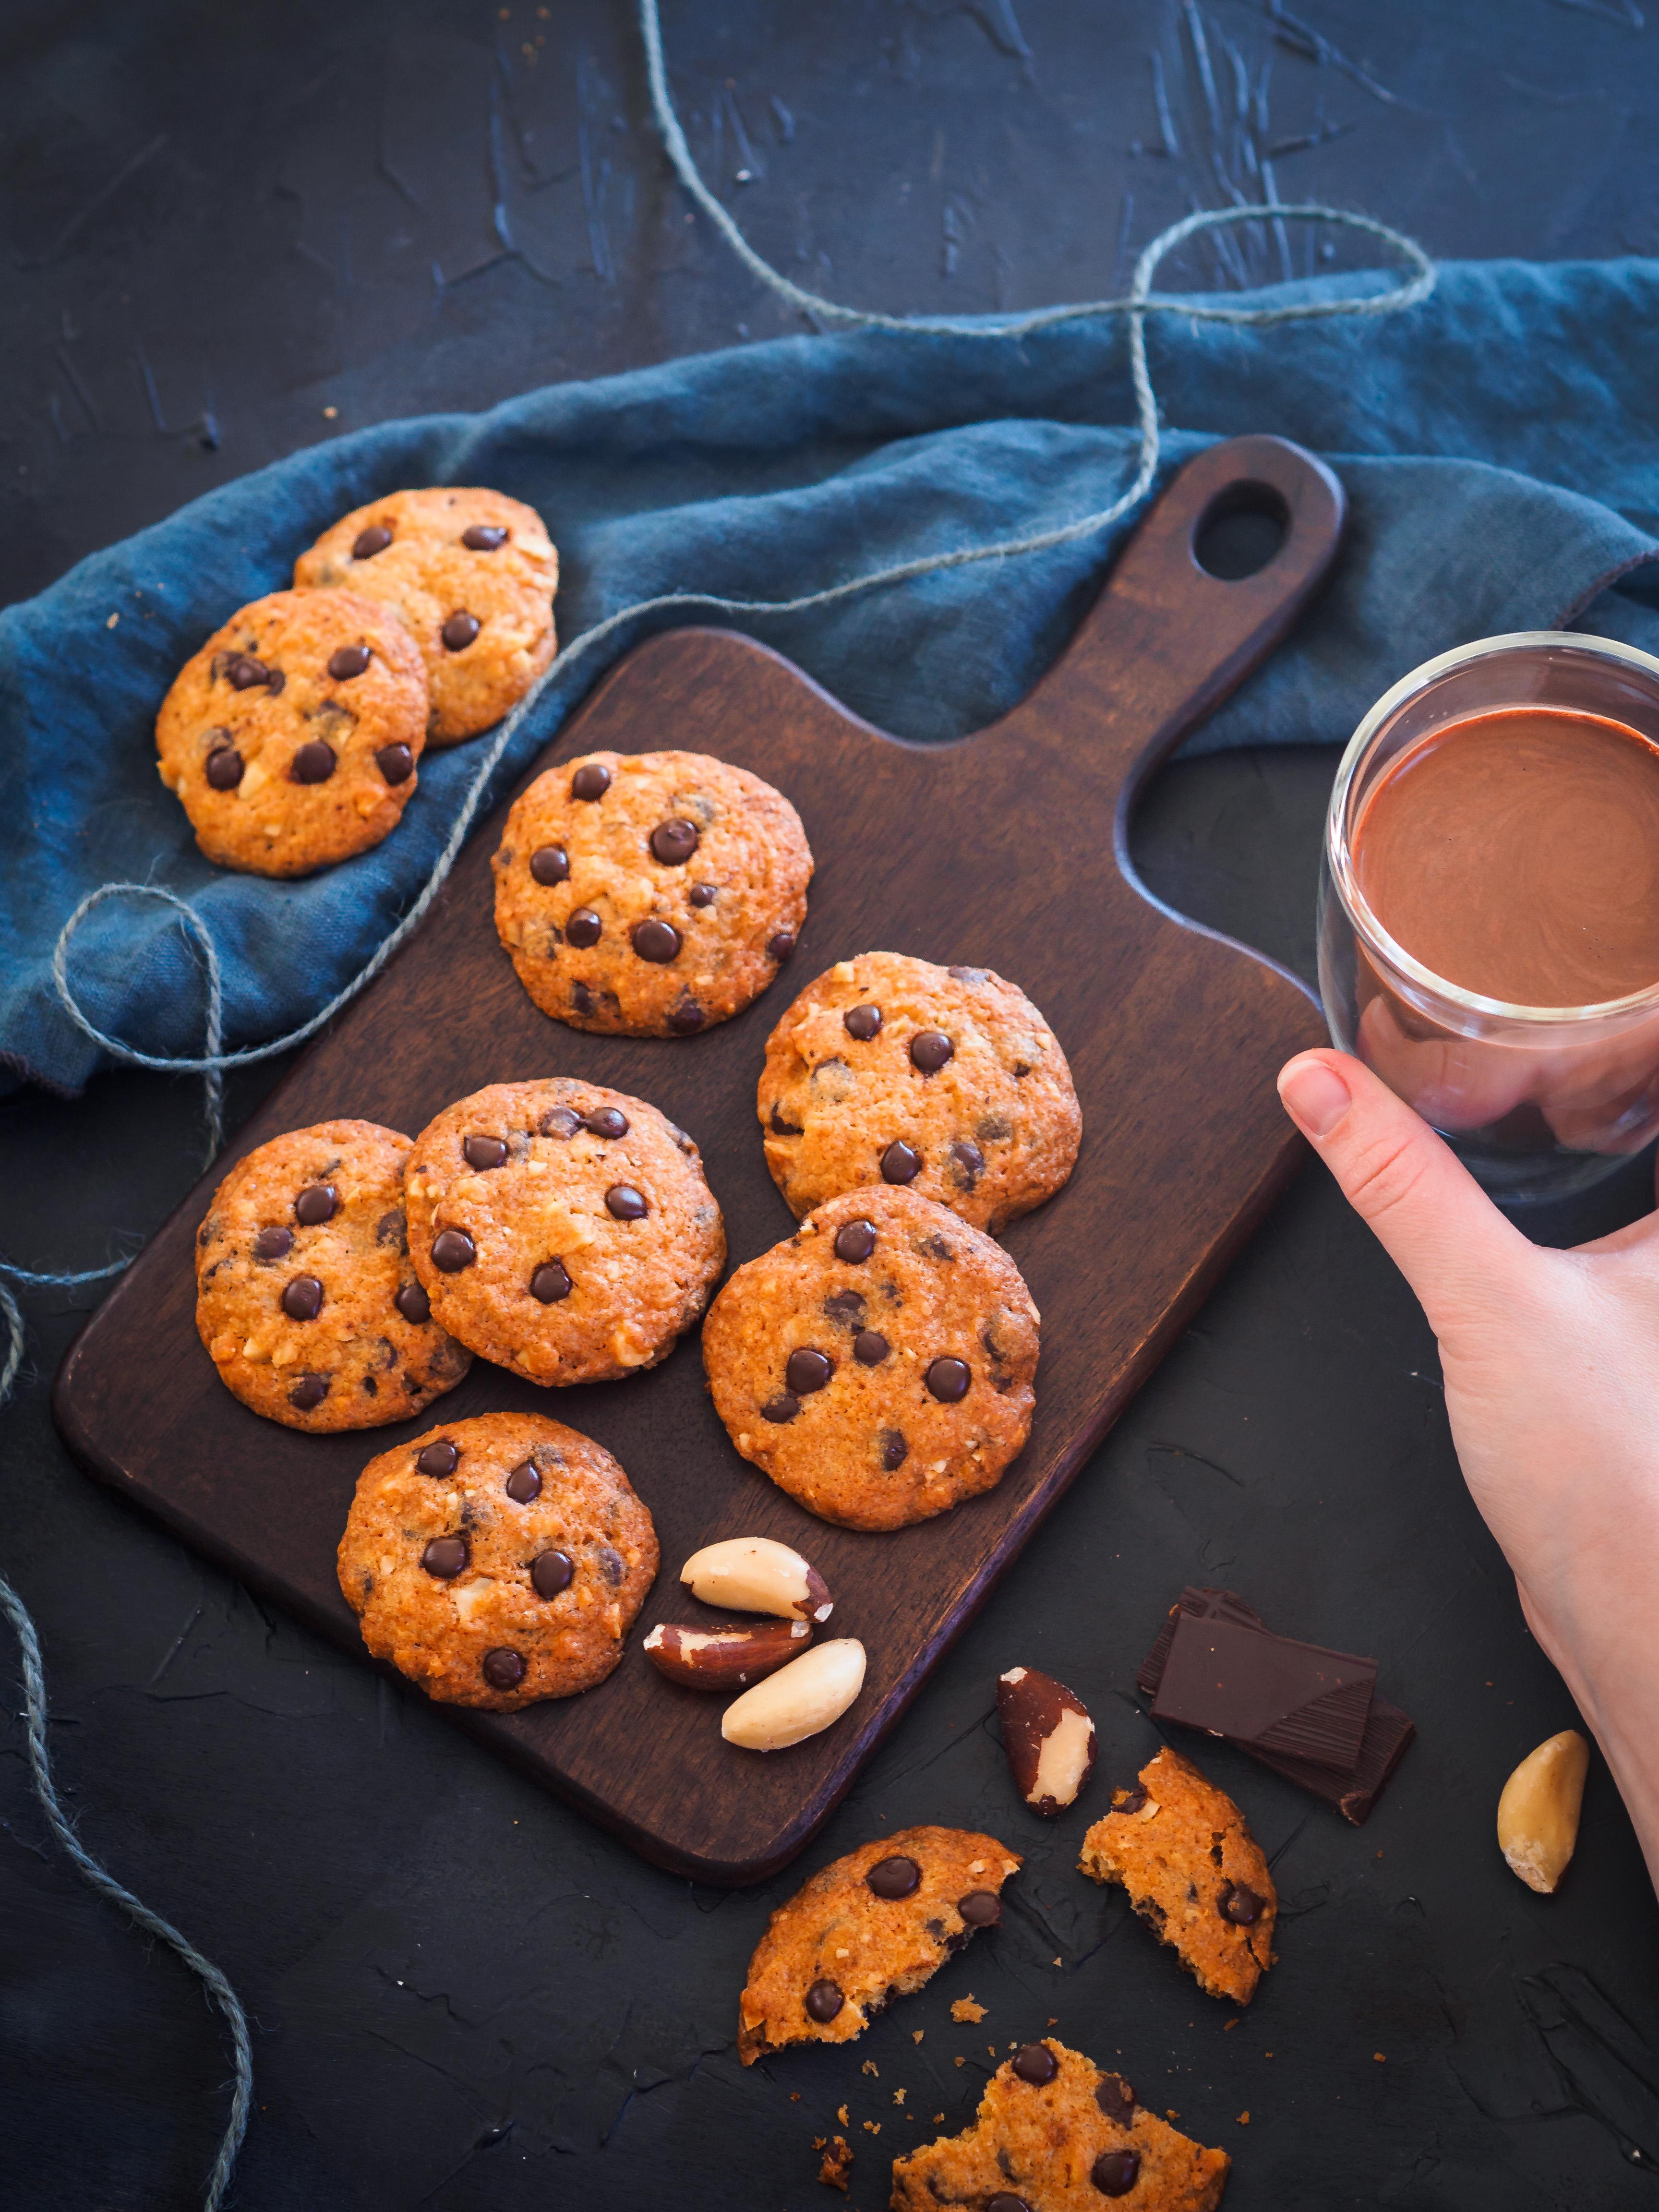 Schokocookies mit Paranüssen